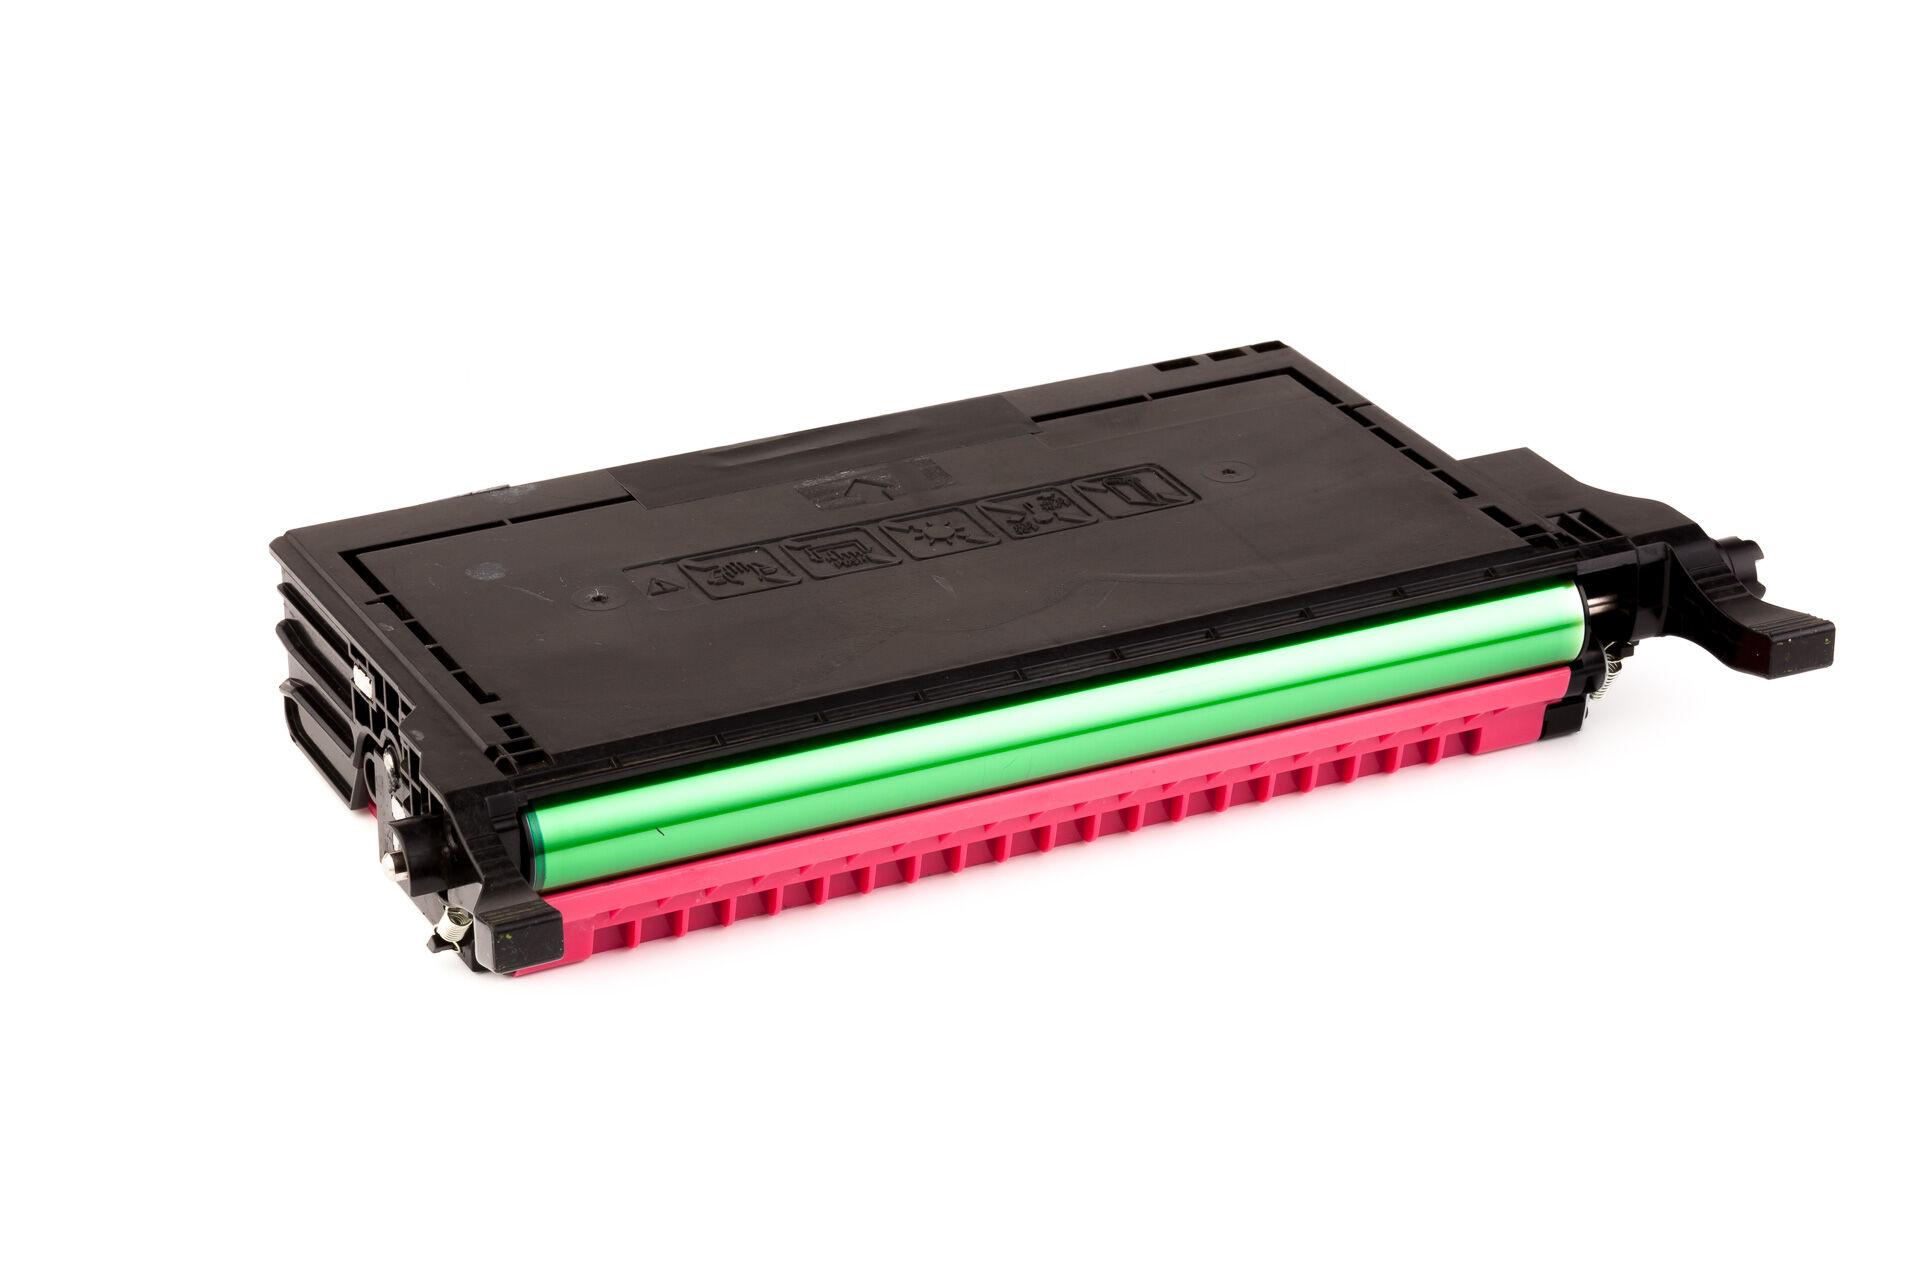 Dell Cartouche de Toner pour Dell 59310370 / K757K magenta compatible (de marque ASC)